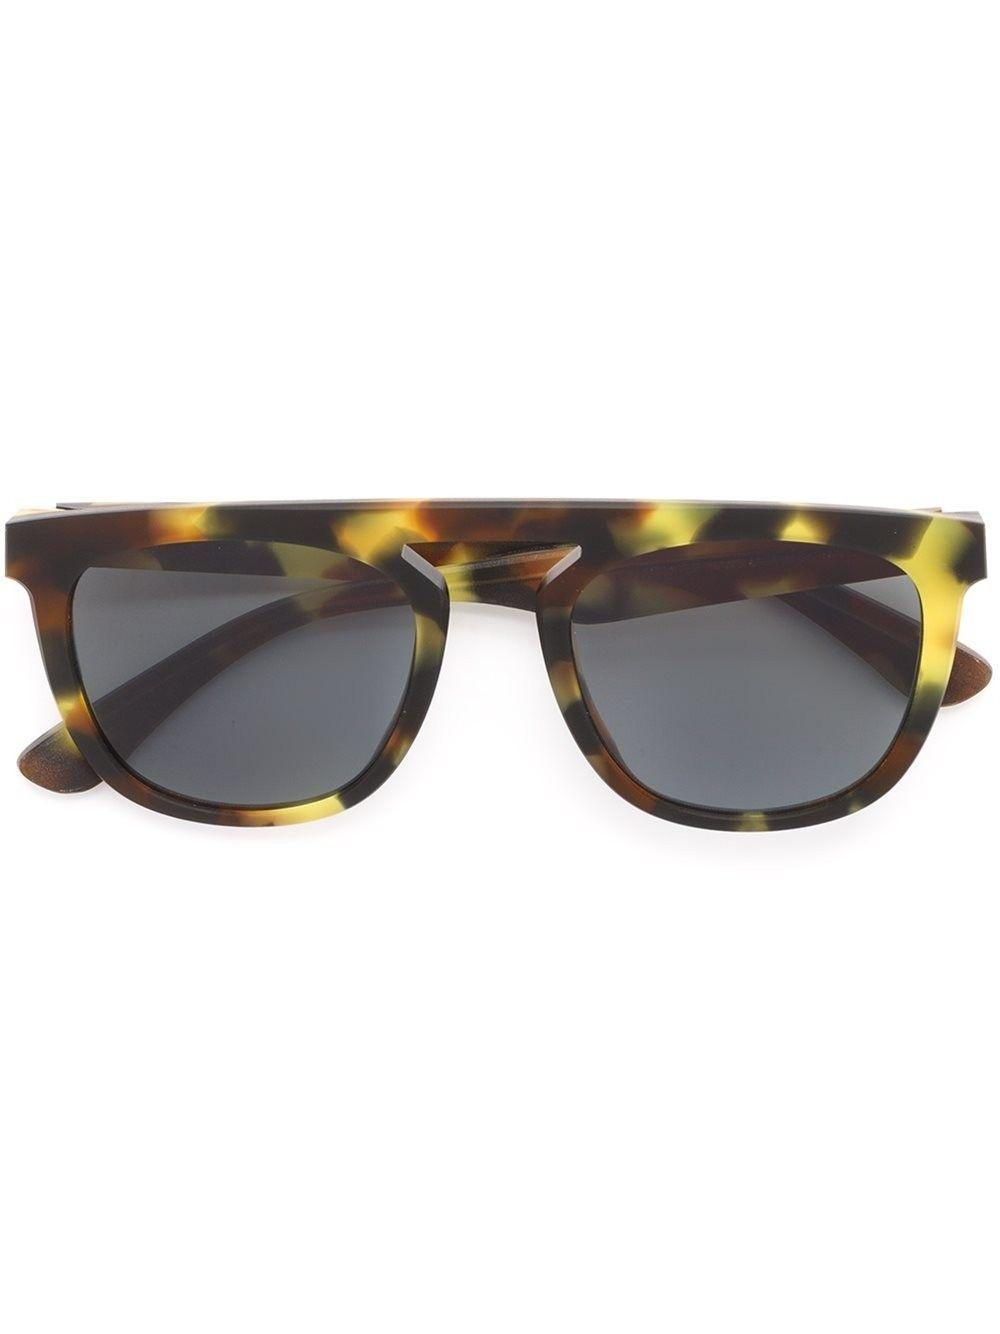 MAISON MARGIELA Maison Martin Margiela x Mykita 'MMRAW004' sunglasses. #maisonmargiela #